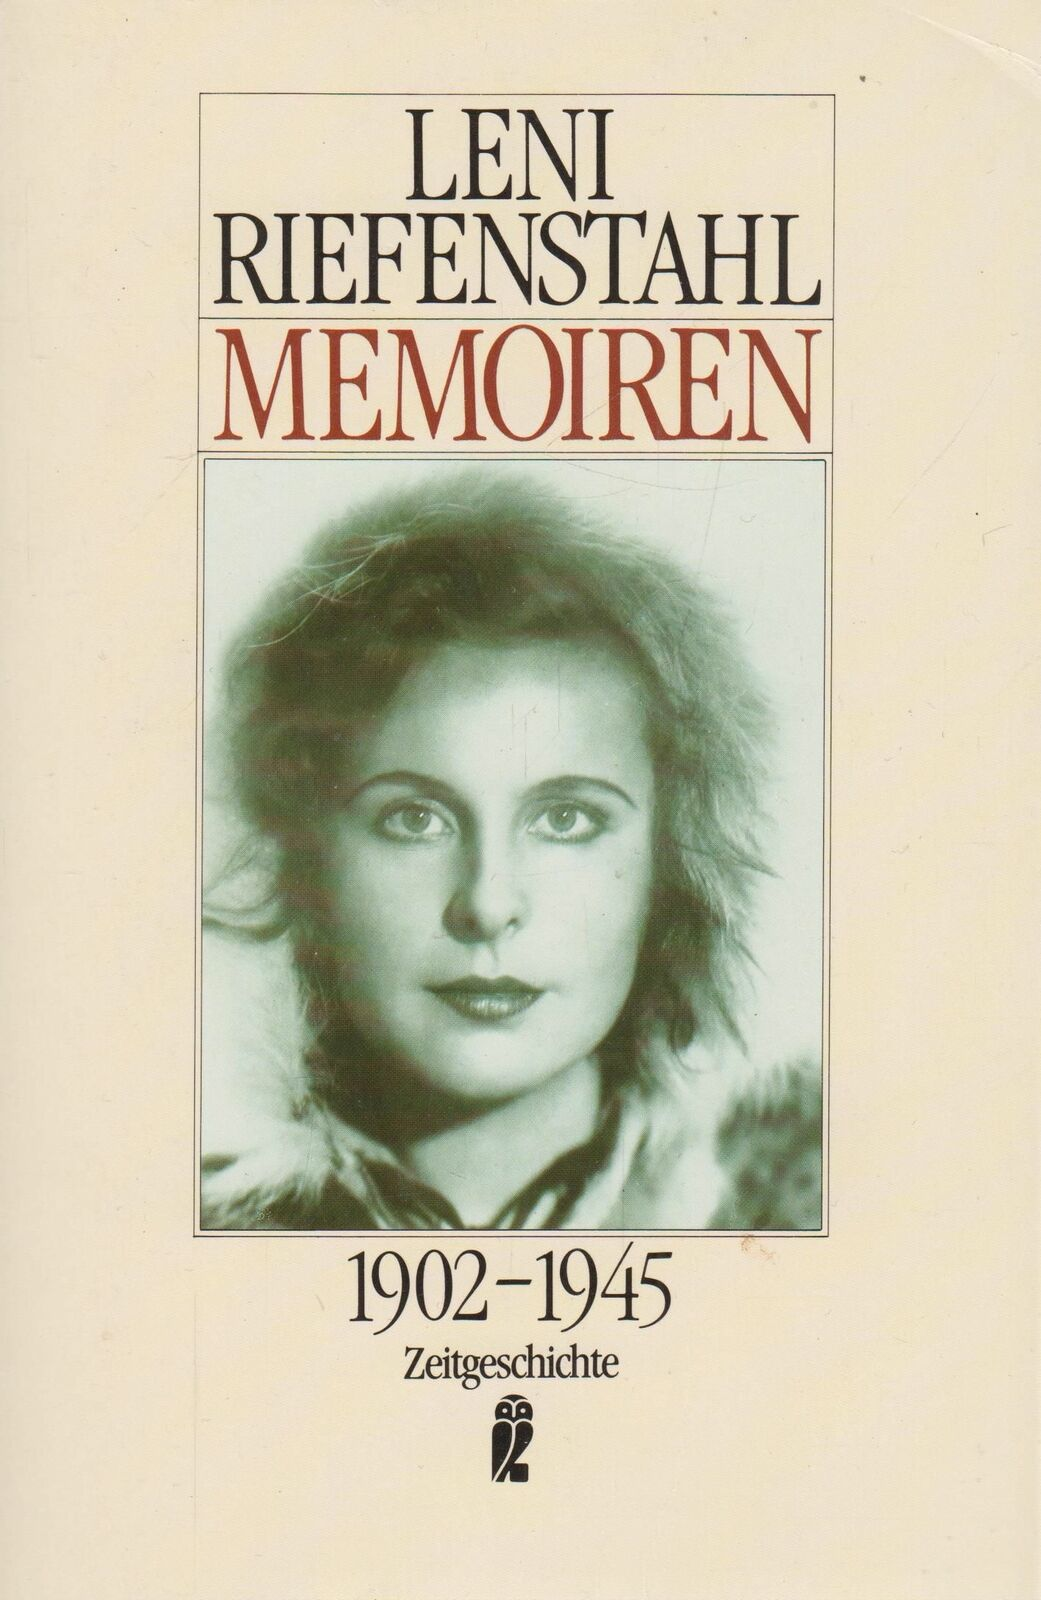 Buch: Memoiren 1902-1945. Riefenstahl, Leni, 1996, Ullstein Verlag - Riefenstahl, Leni